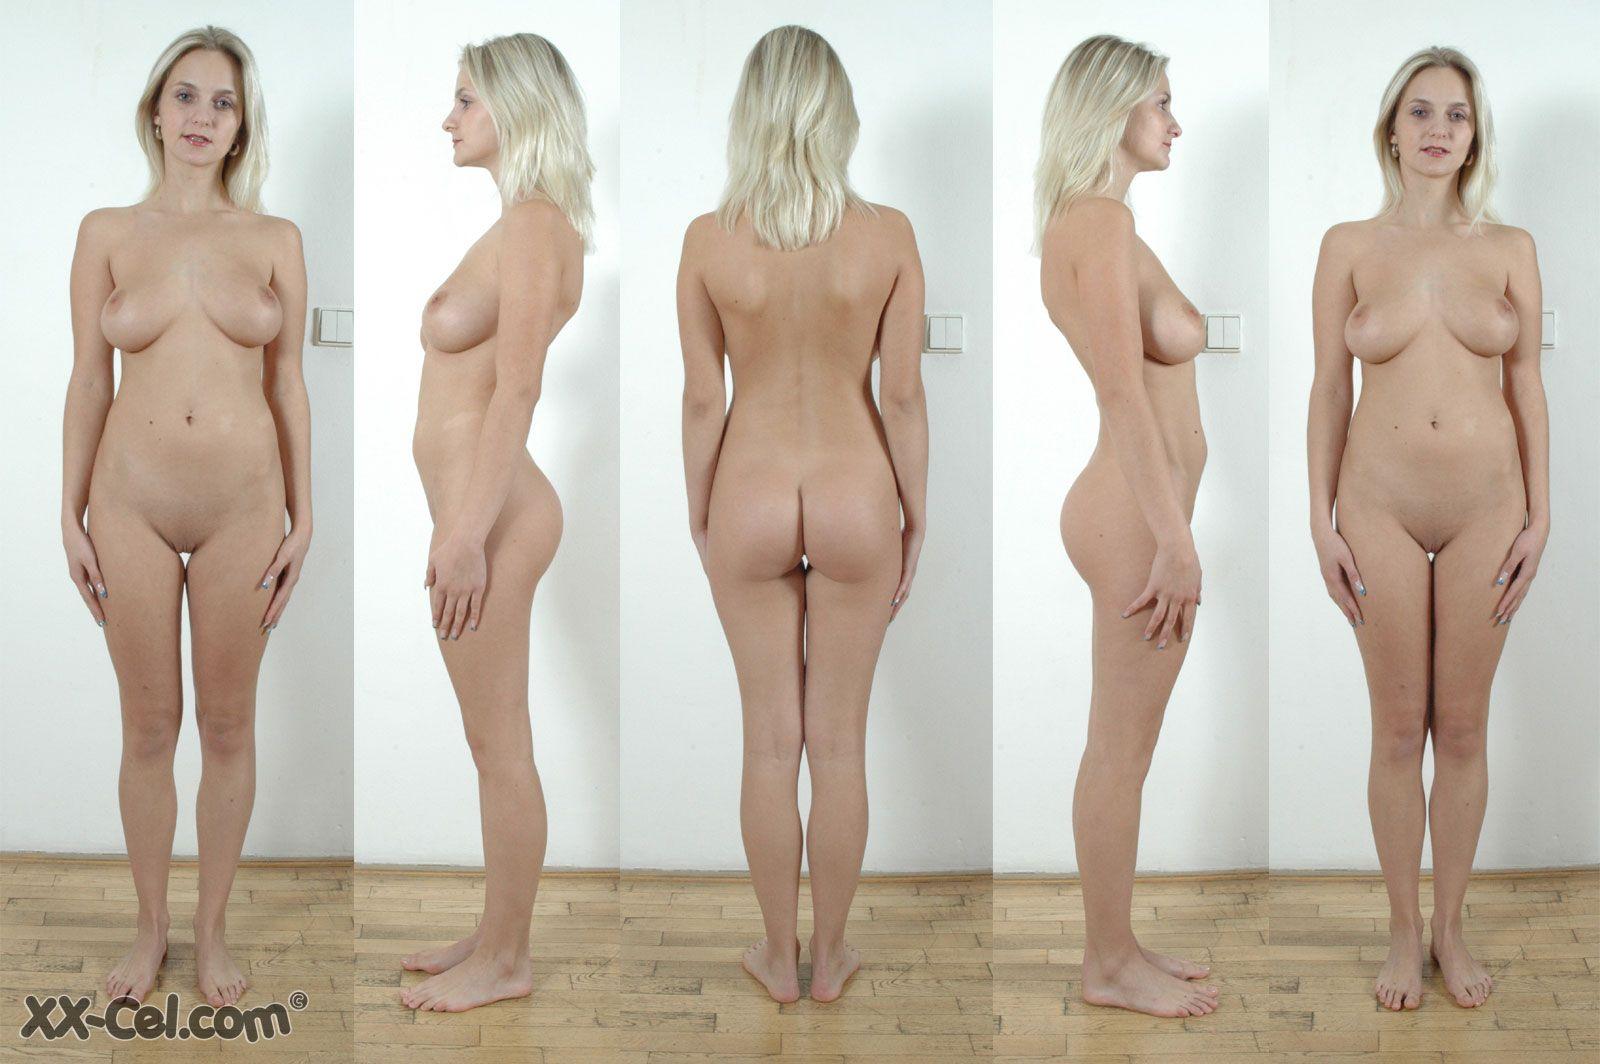 Nude Female Anatomy Photographs